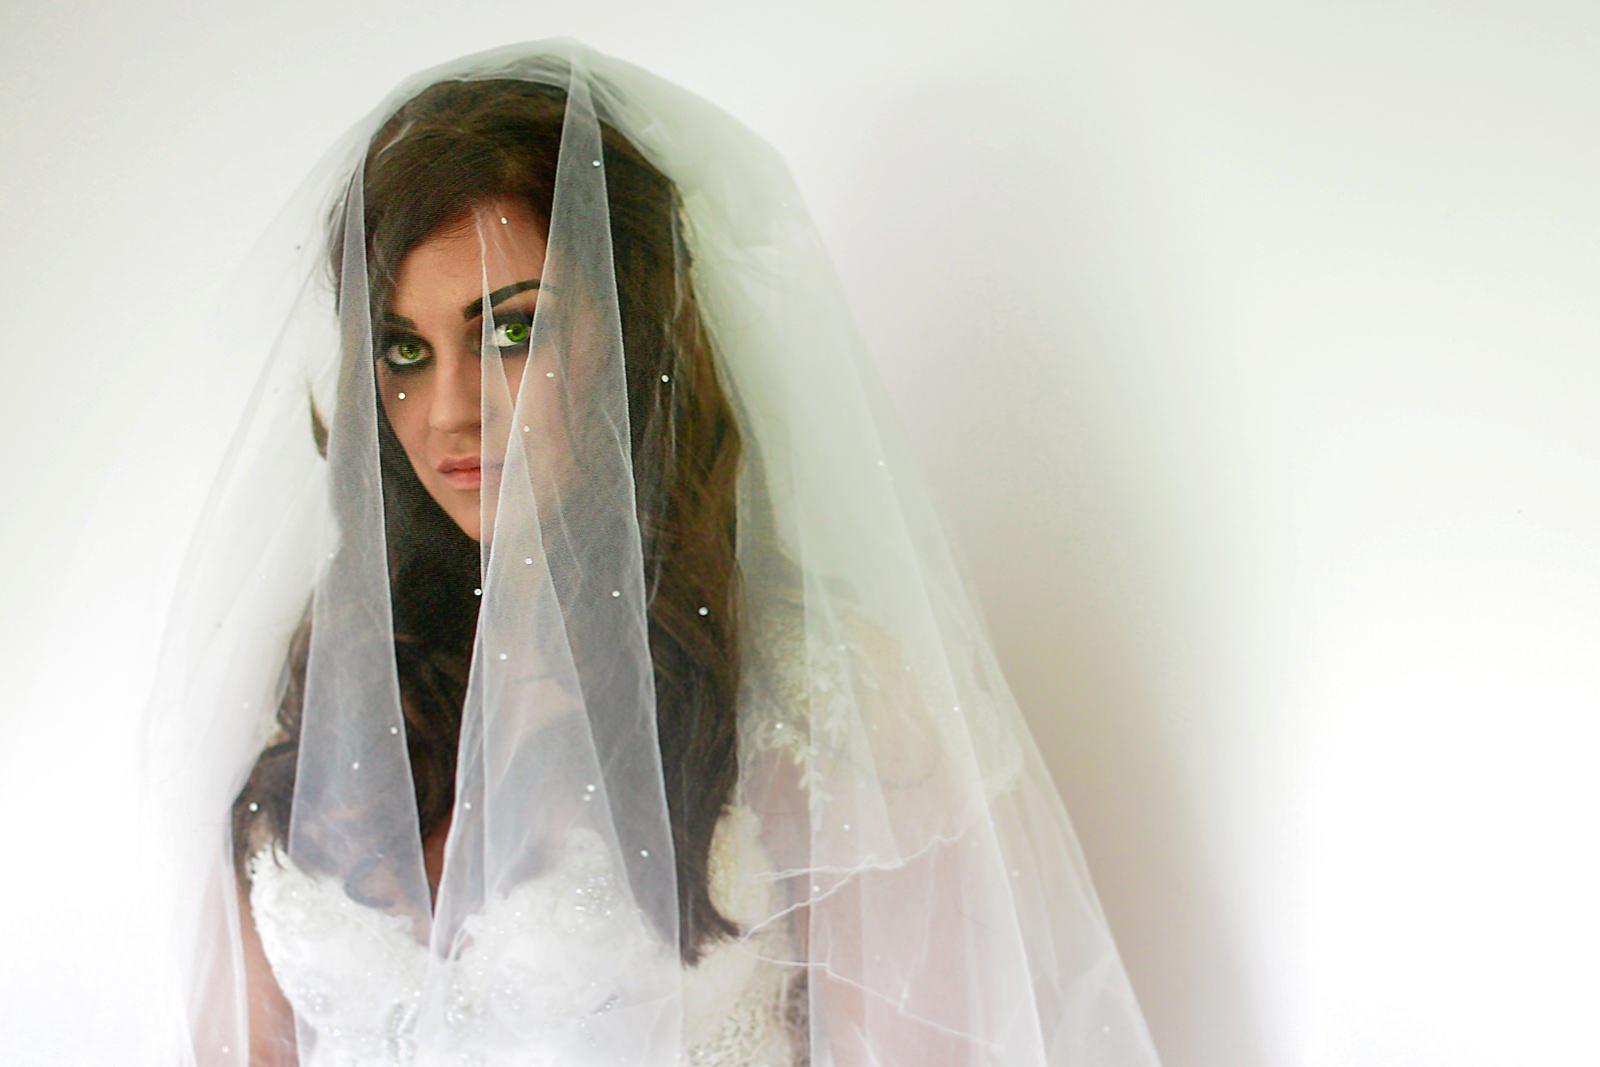 Galia lahav haute couture Giselle dress - West Tower Wedding Photography by Lancashire wedding Photographer Wes Simpson_0010